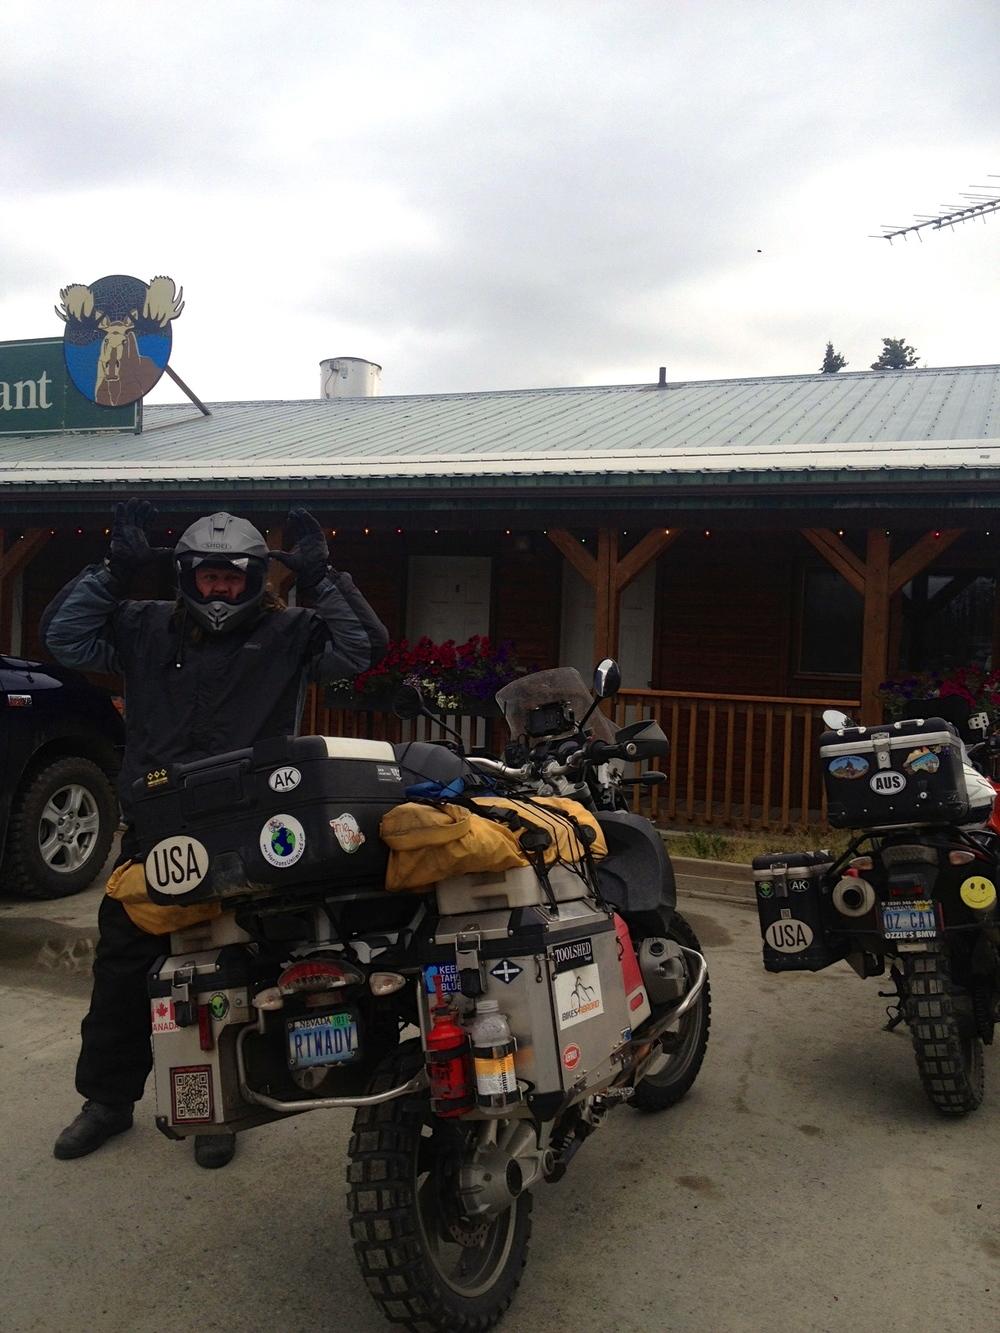 Roadside Service Station/RV Park/Motel/Restaurant/Museum in Teslin